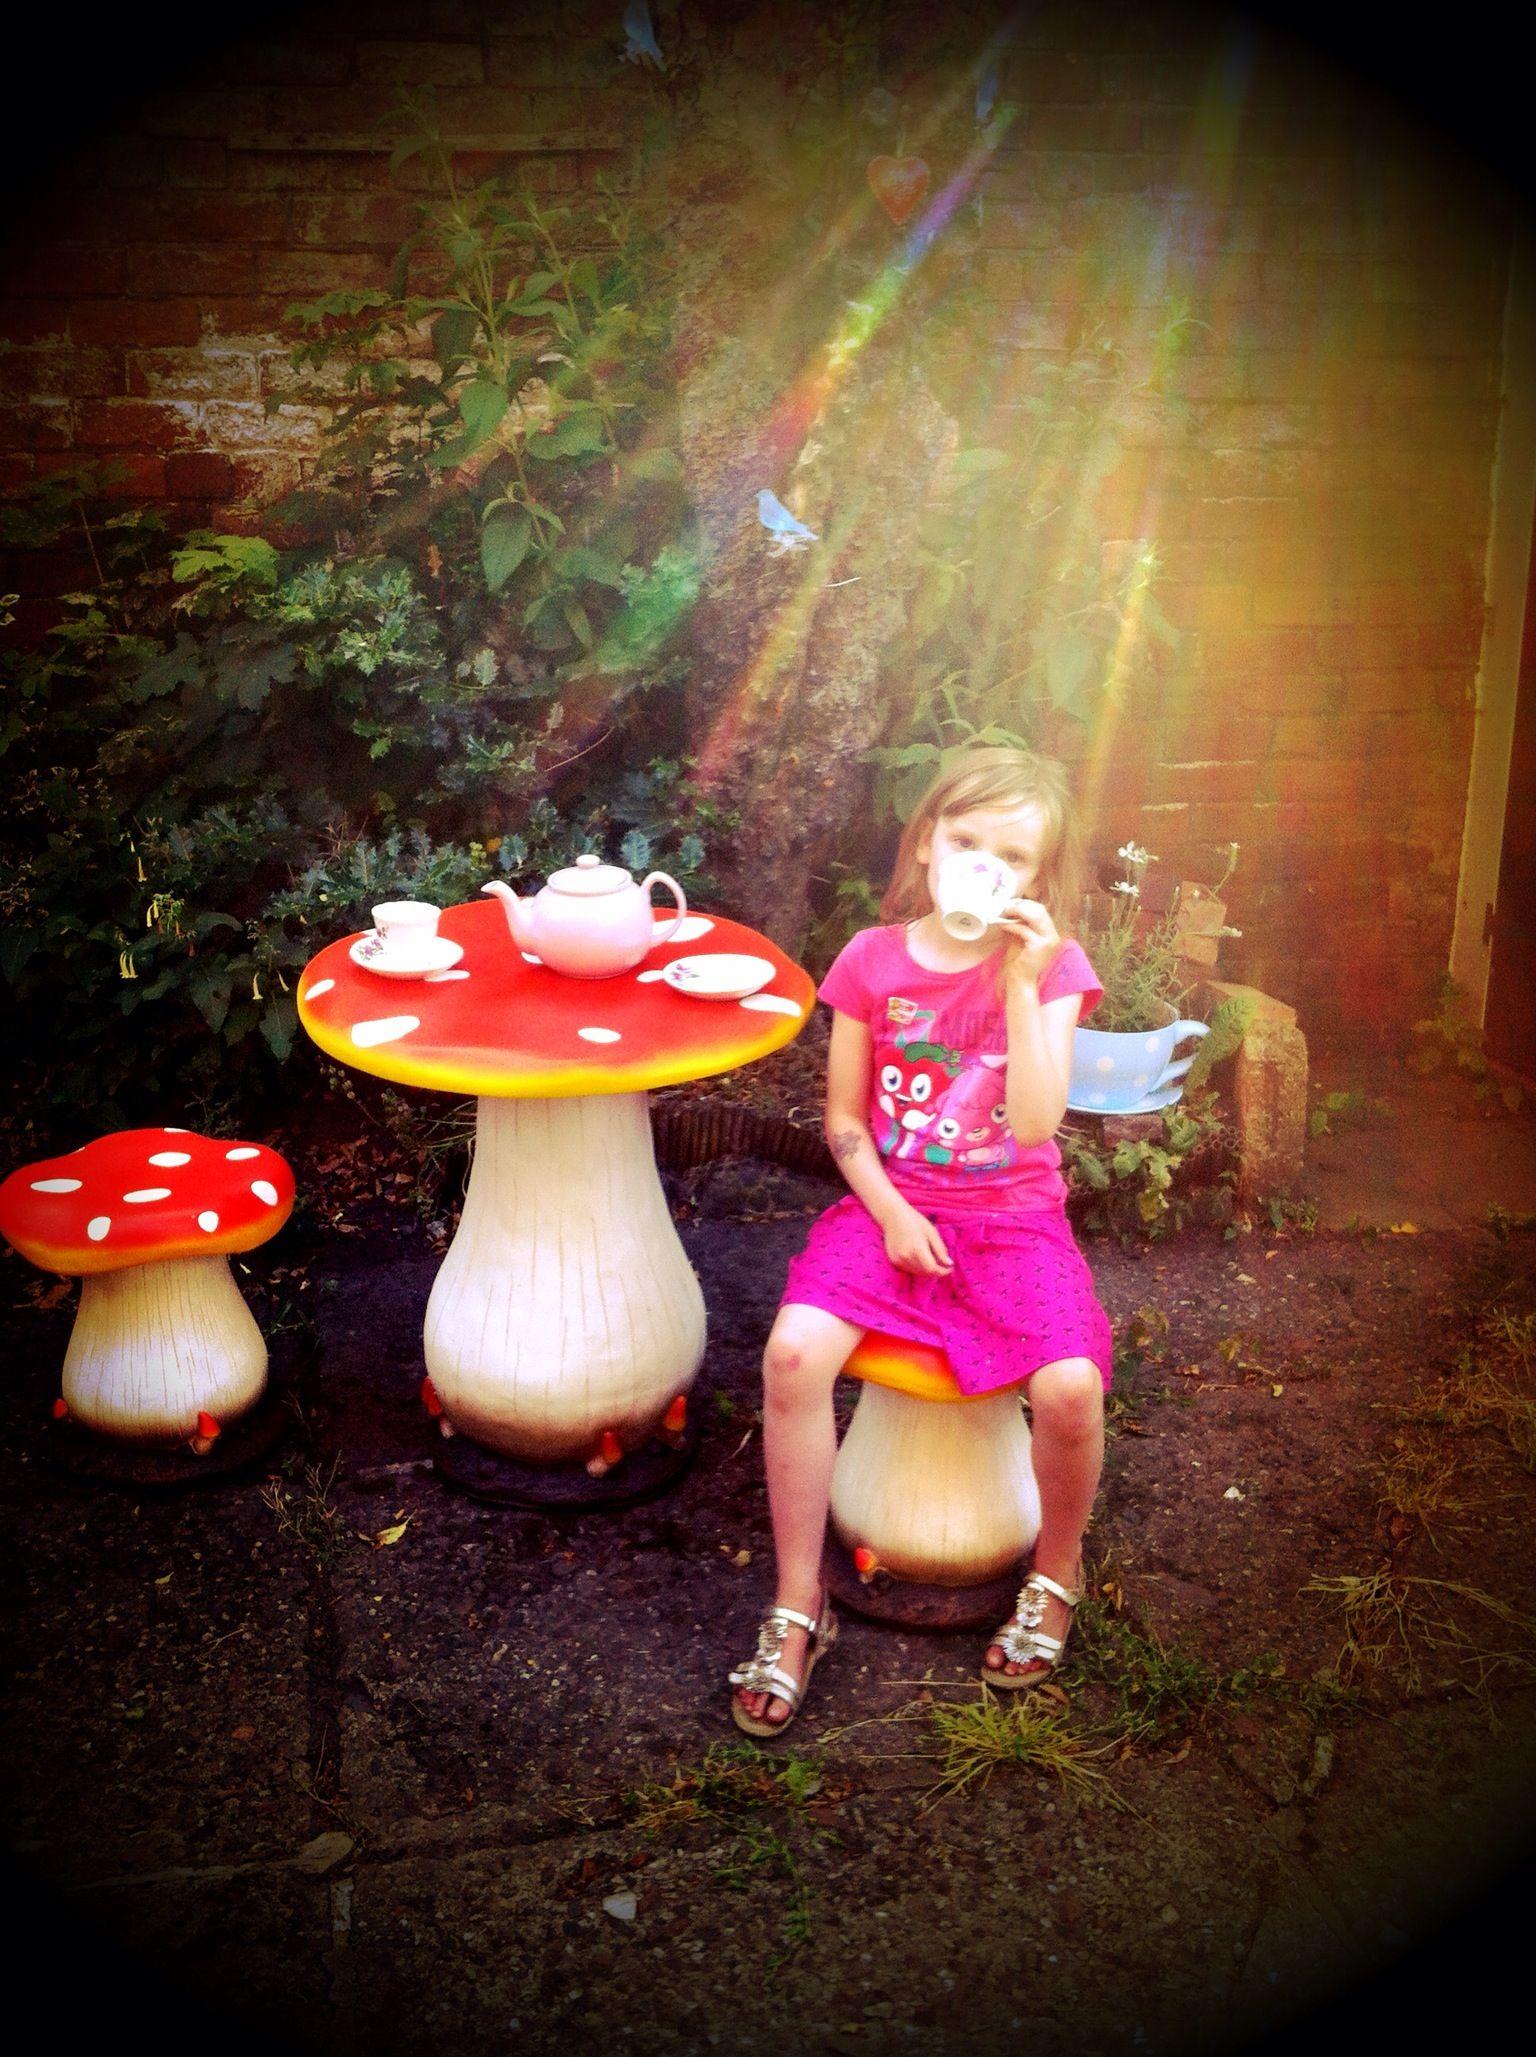 toadstool table chairs alice in wonderland garden theme dream garden pinterest gartenideen. Black Bedroom Furniture Sets. Home Design Ideas